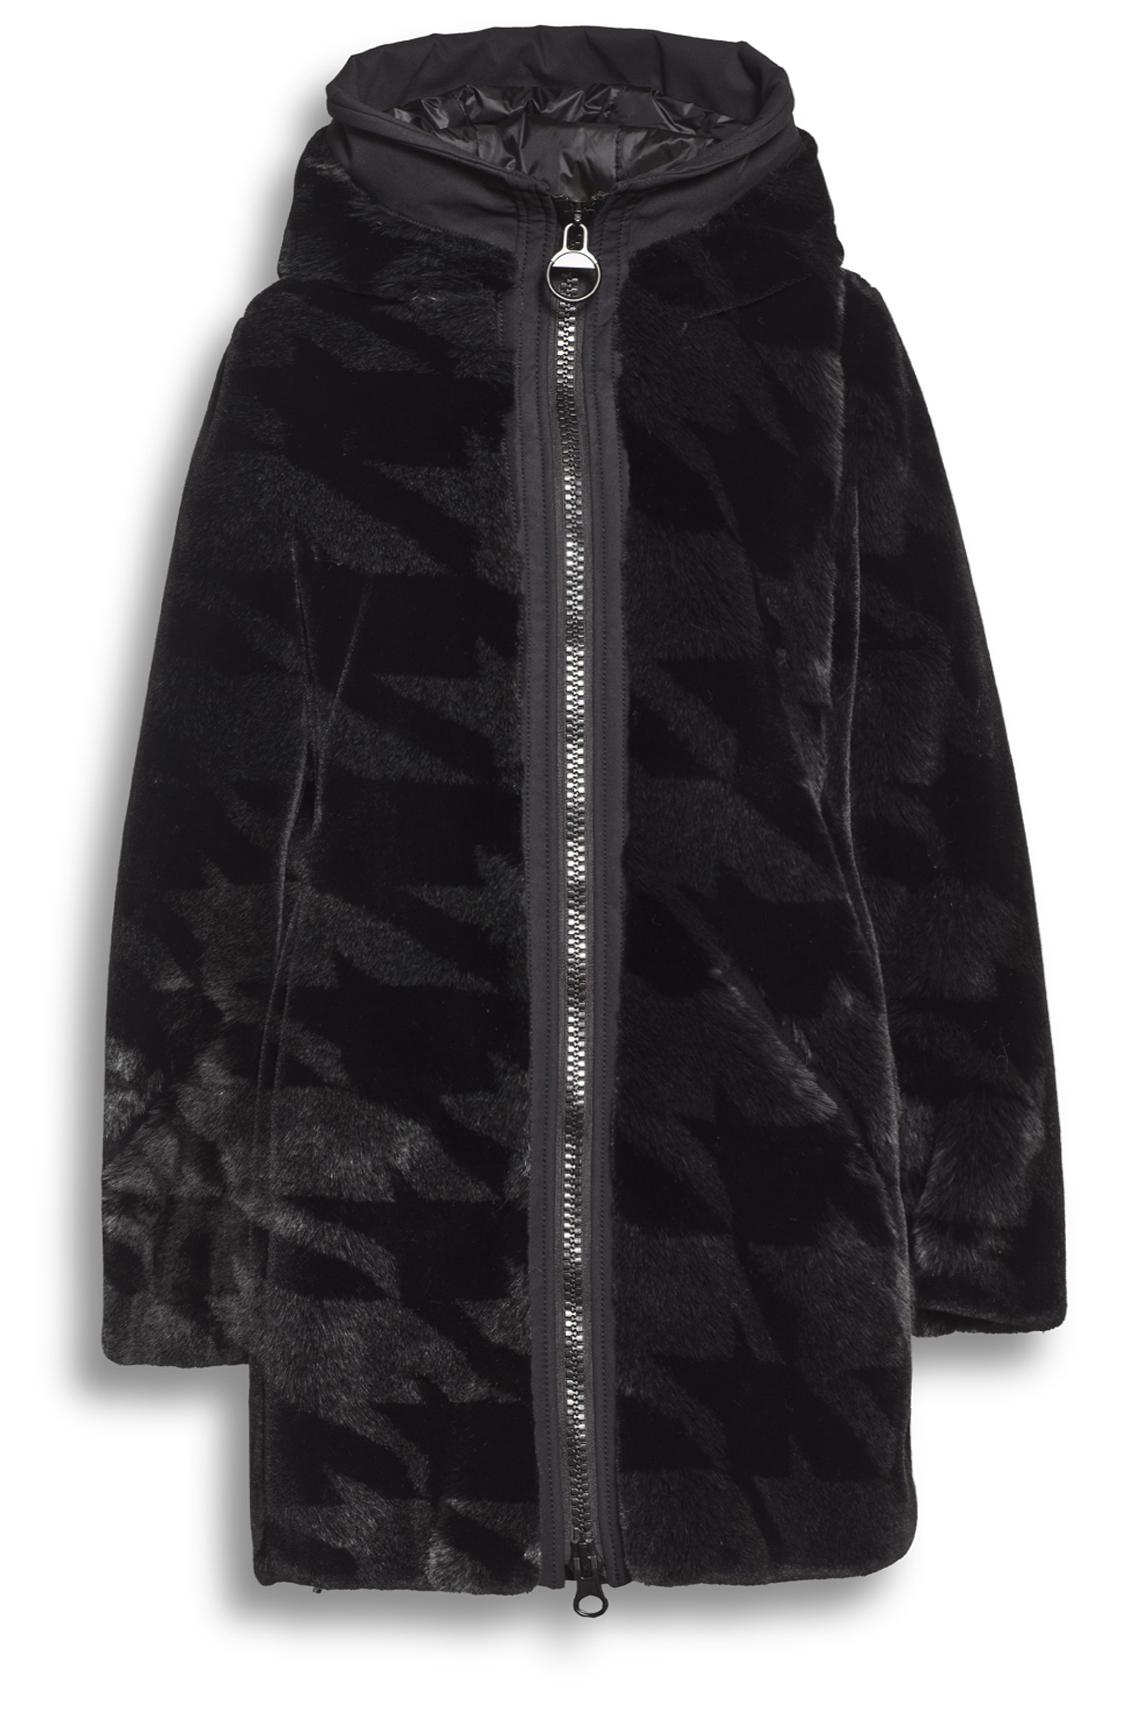 Creenstone jas met fake fur details